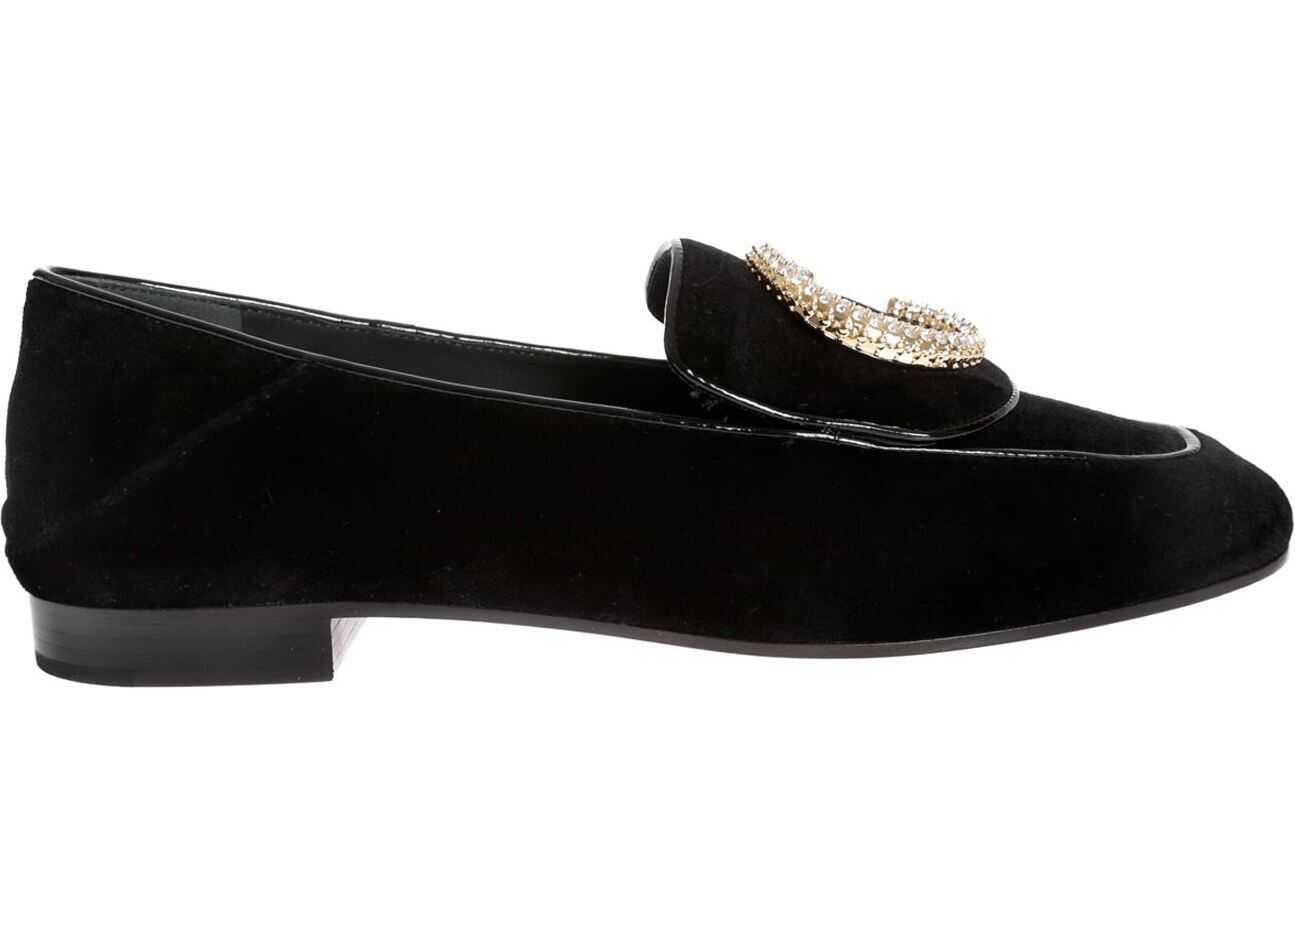 Chloe Loafers In Black Velvet With Crystal Decoration Black